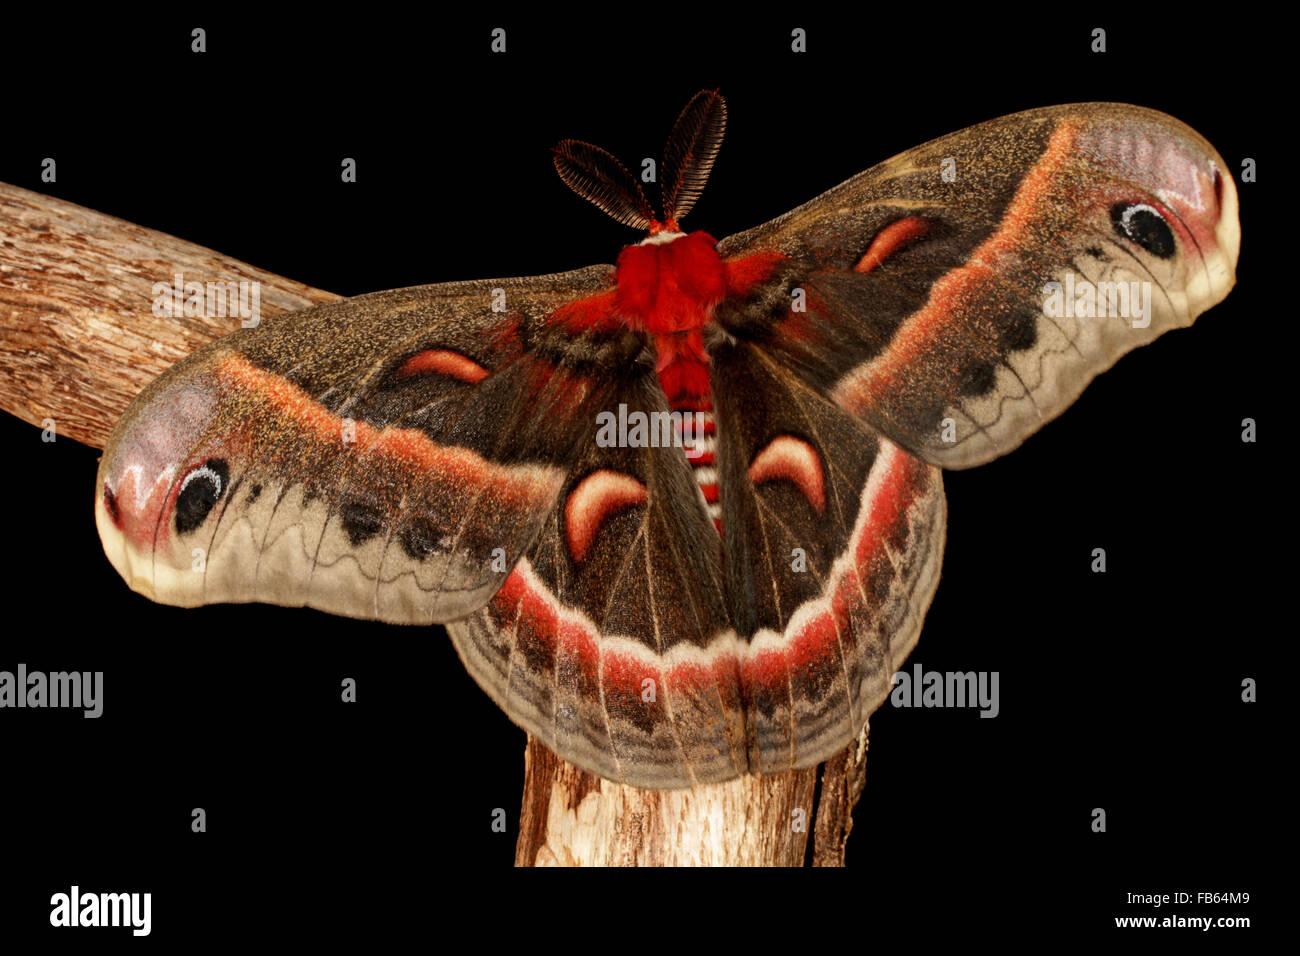 Adult cecropia moth male, Hyalophora cecropia - Stock Image